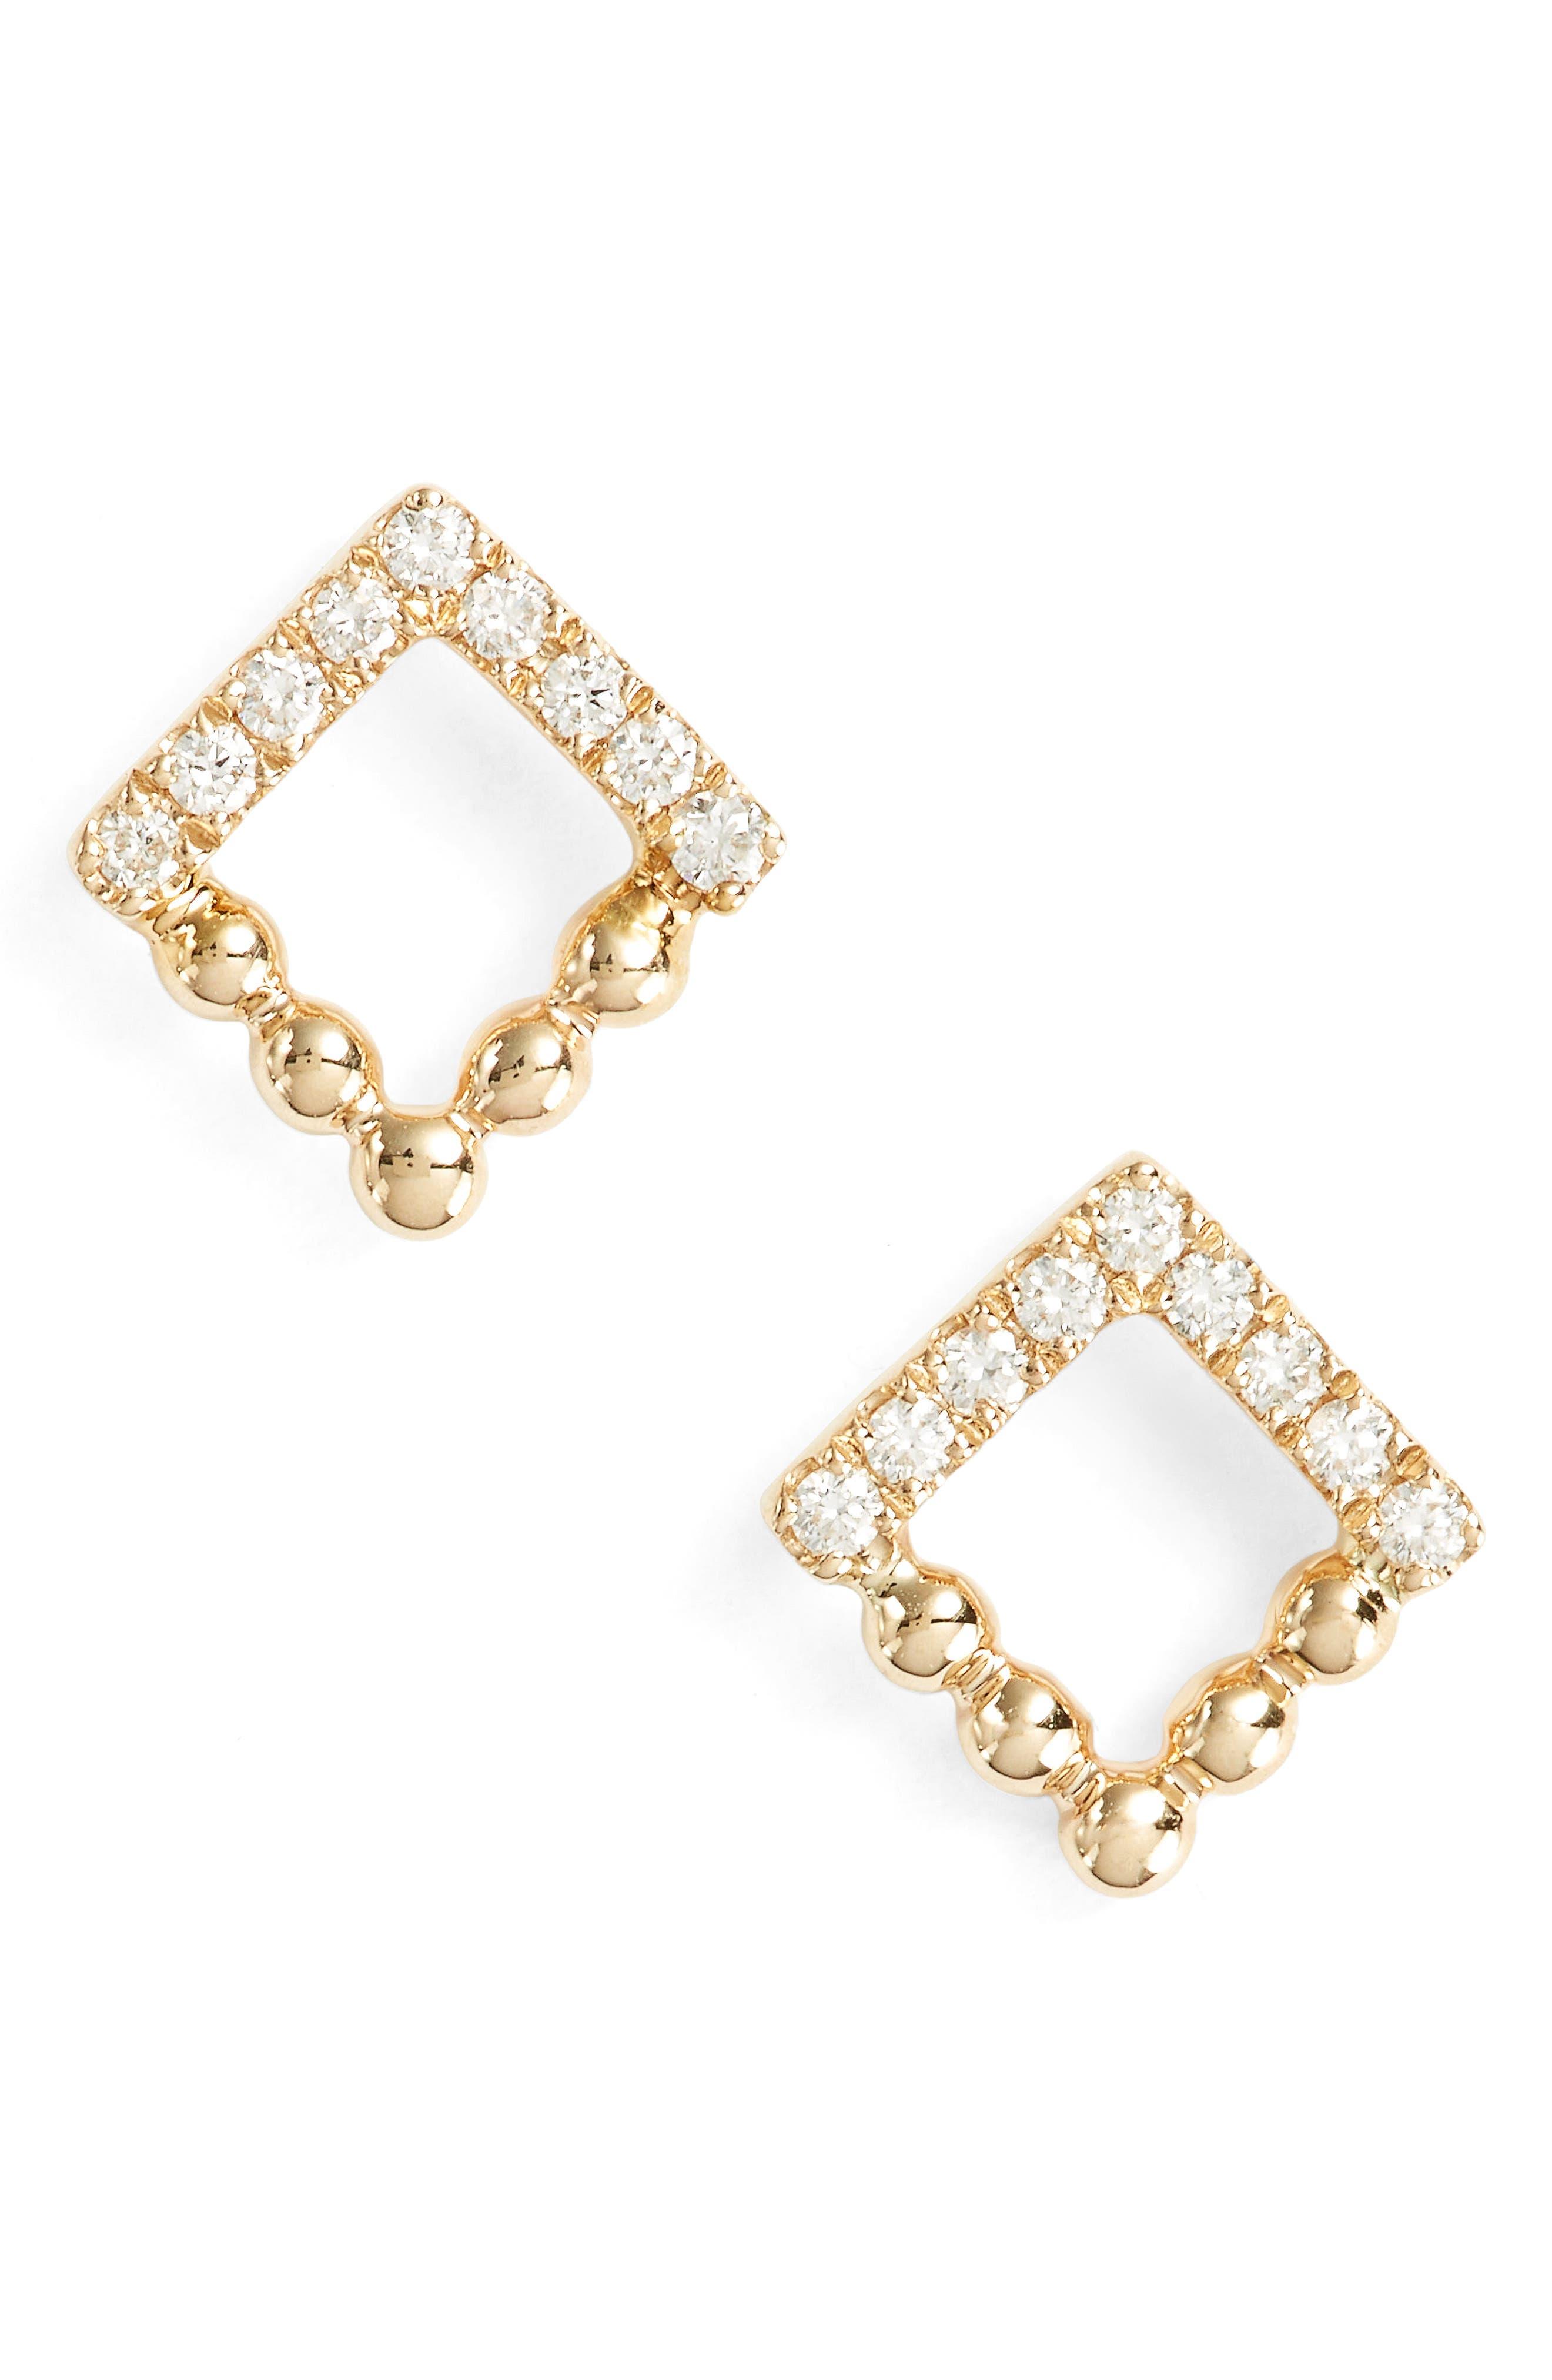 Poppy Rae Square Diamond Stud Earrings,                         Main,                         color, 710